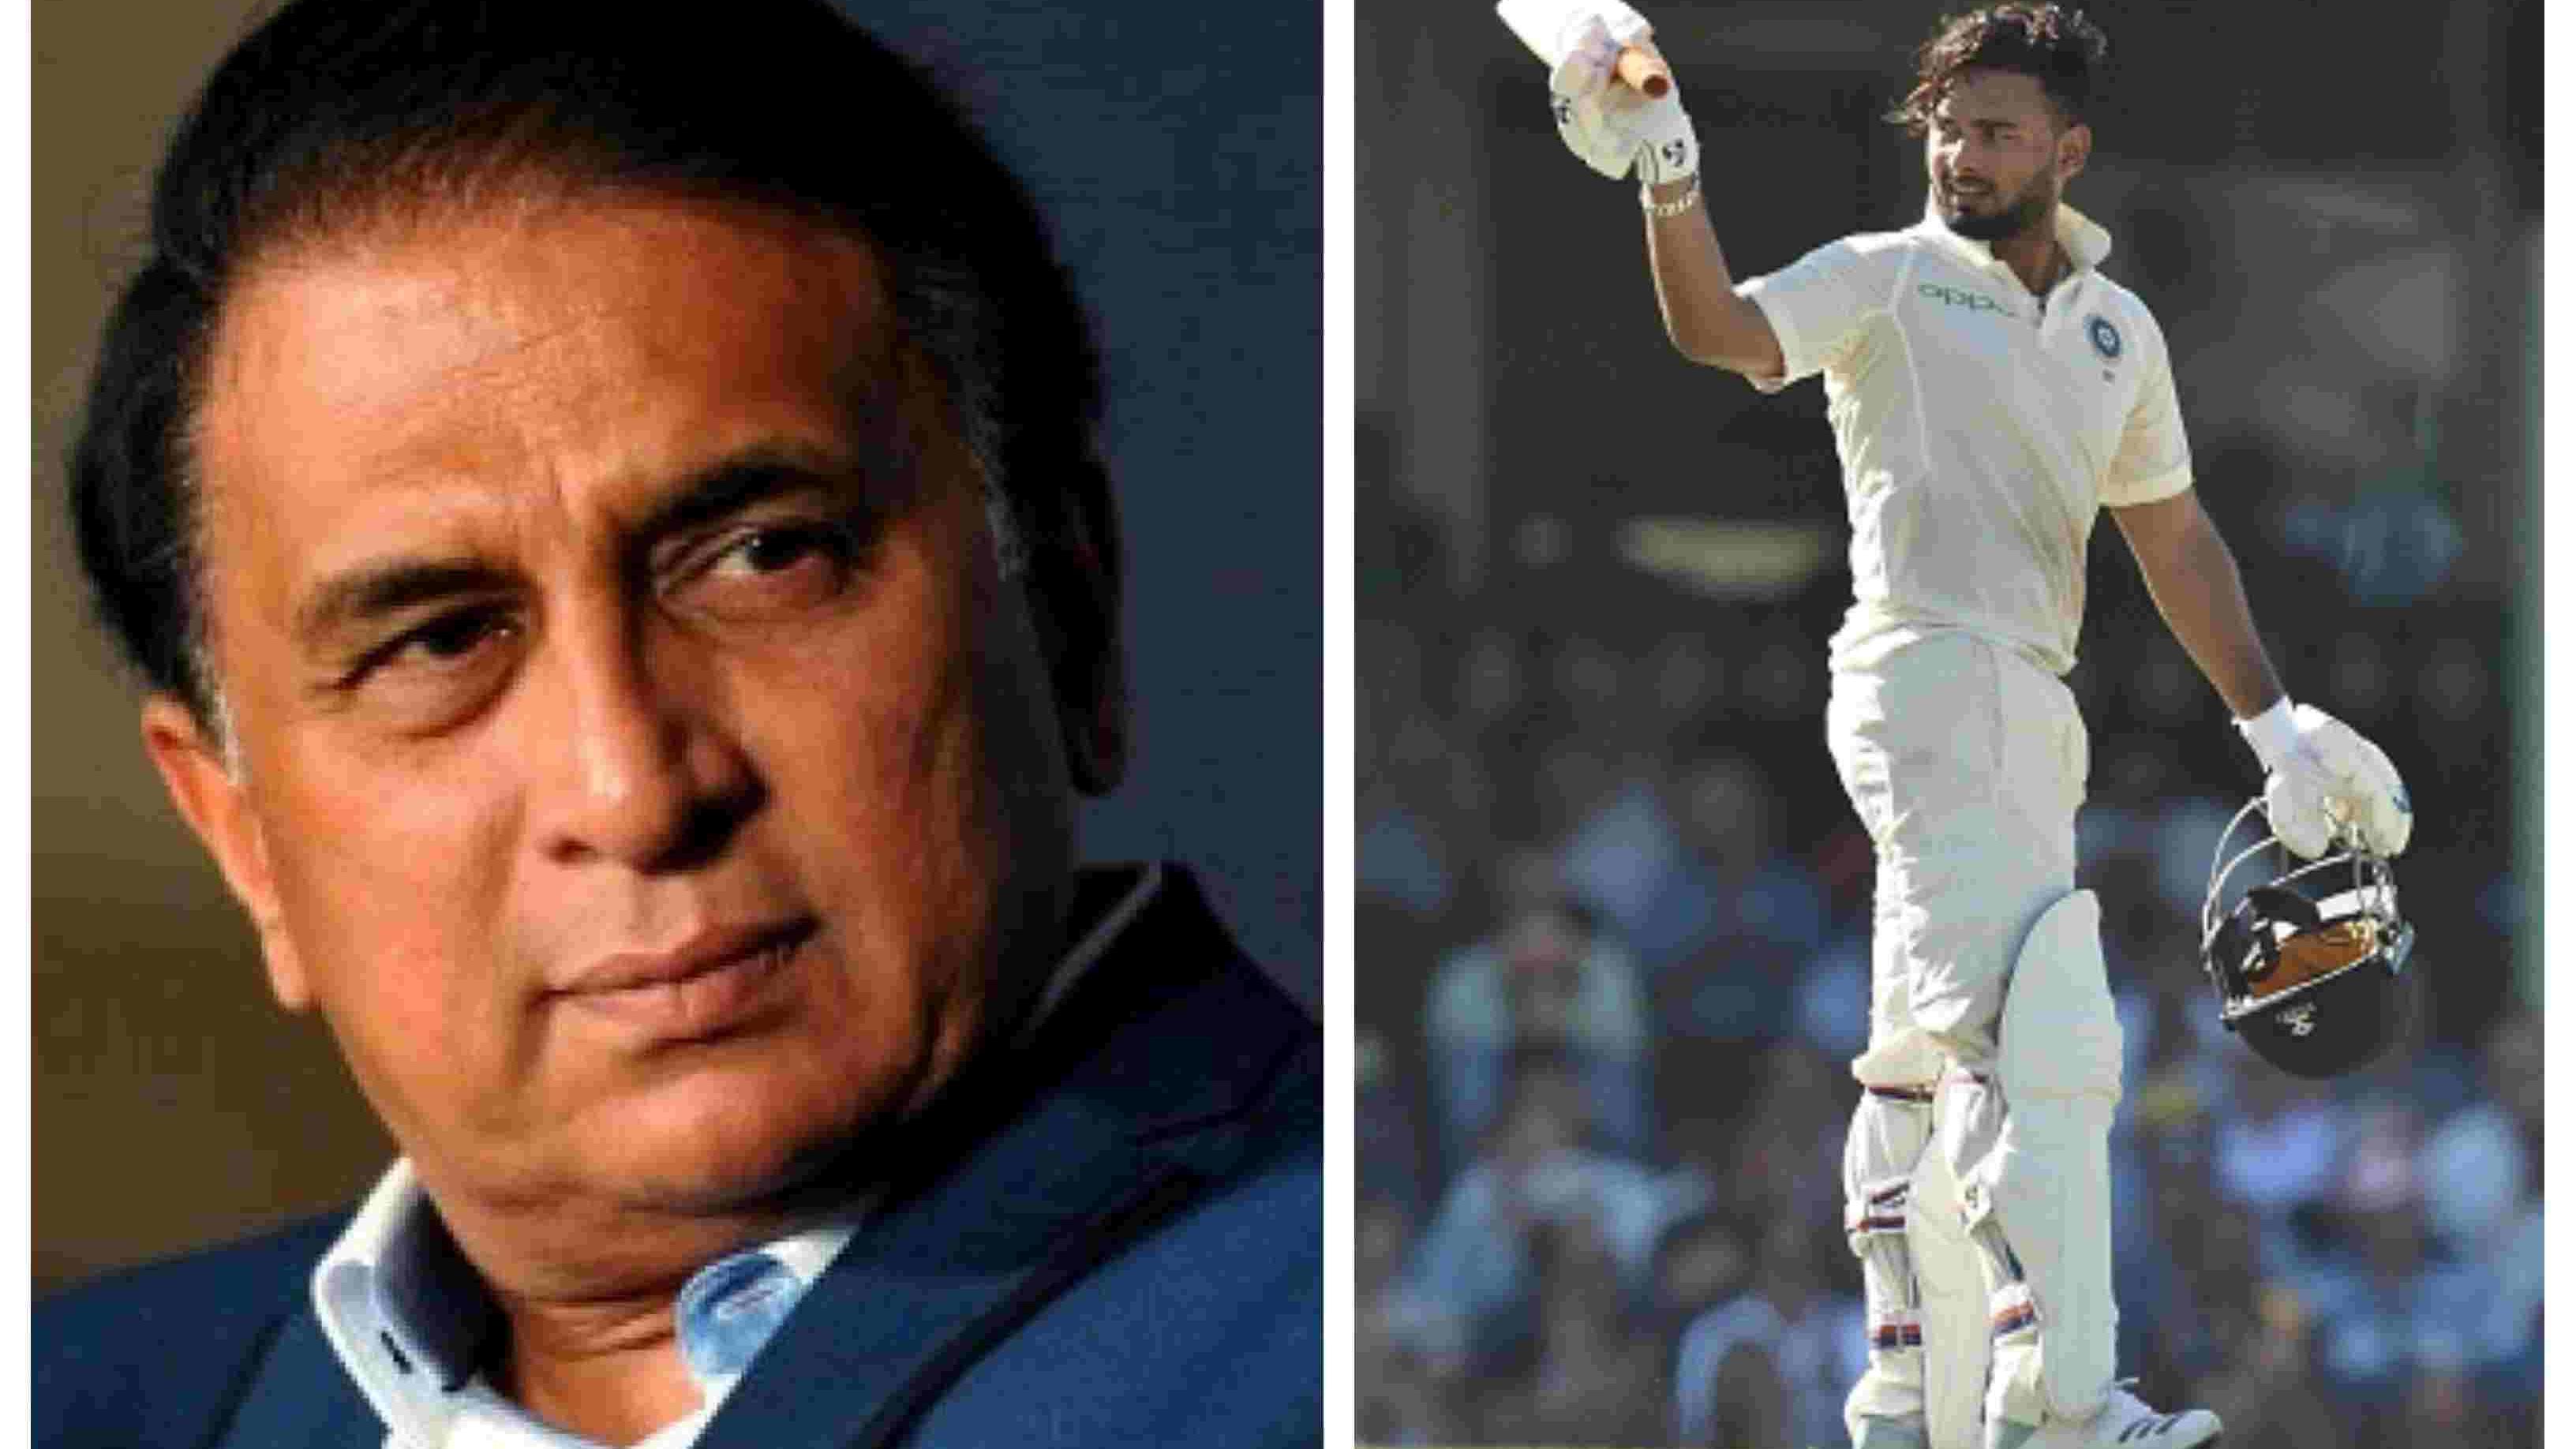 AUS v IND 2018-19: Gavaskar expects more Test tons from Rishabh Pant, wants him to bat at No. 6